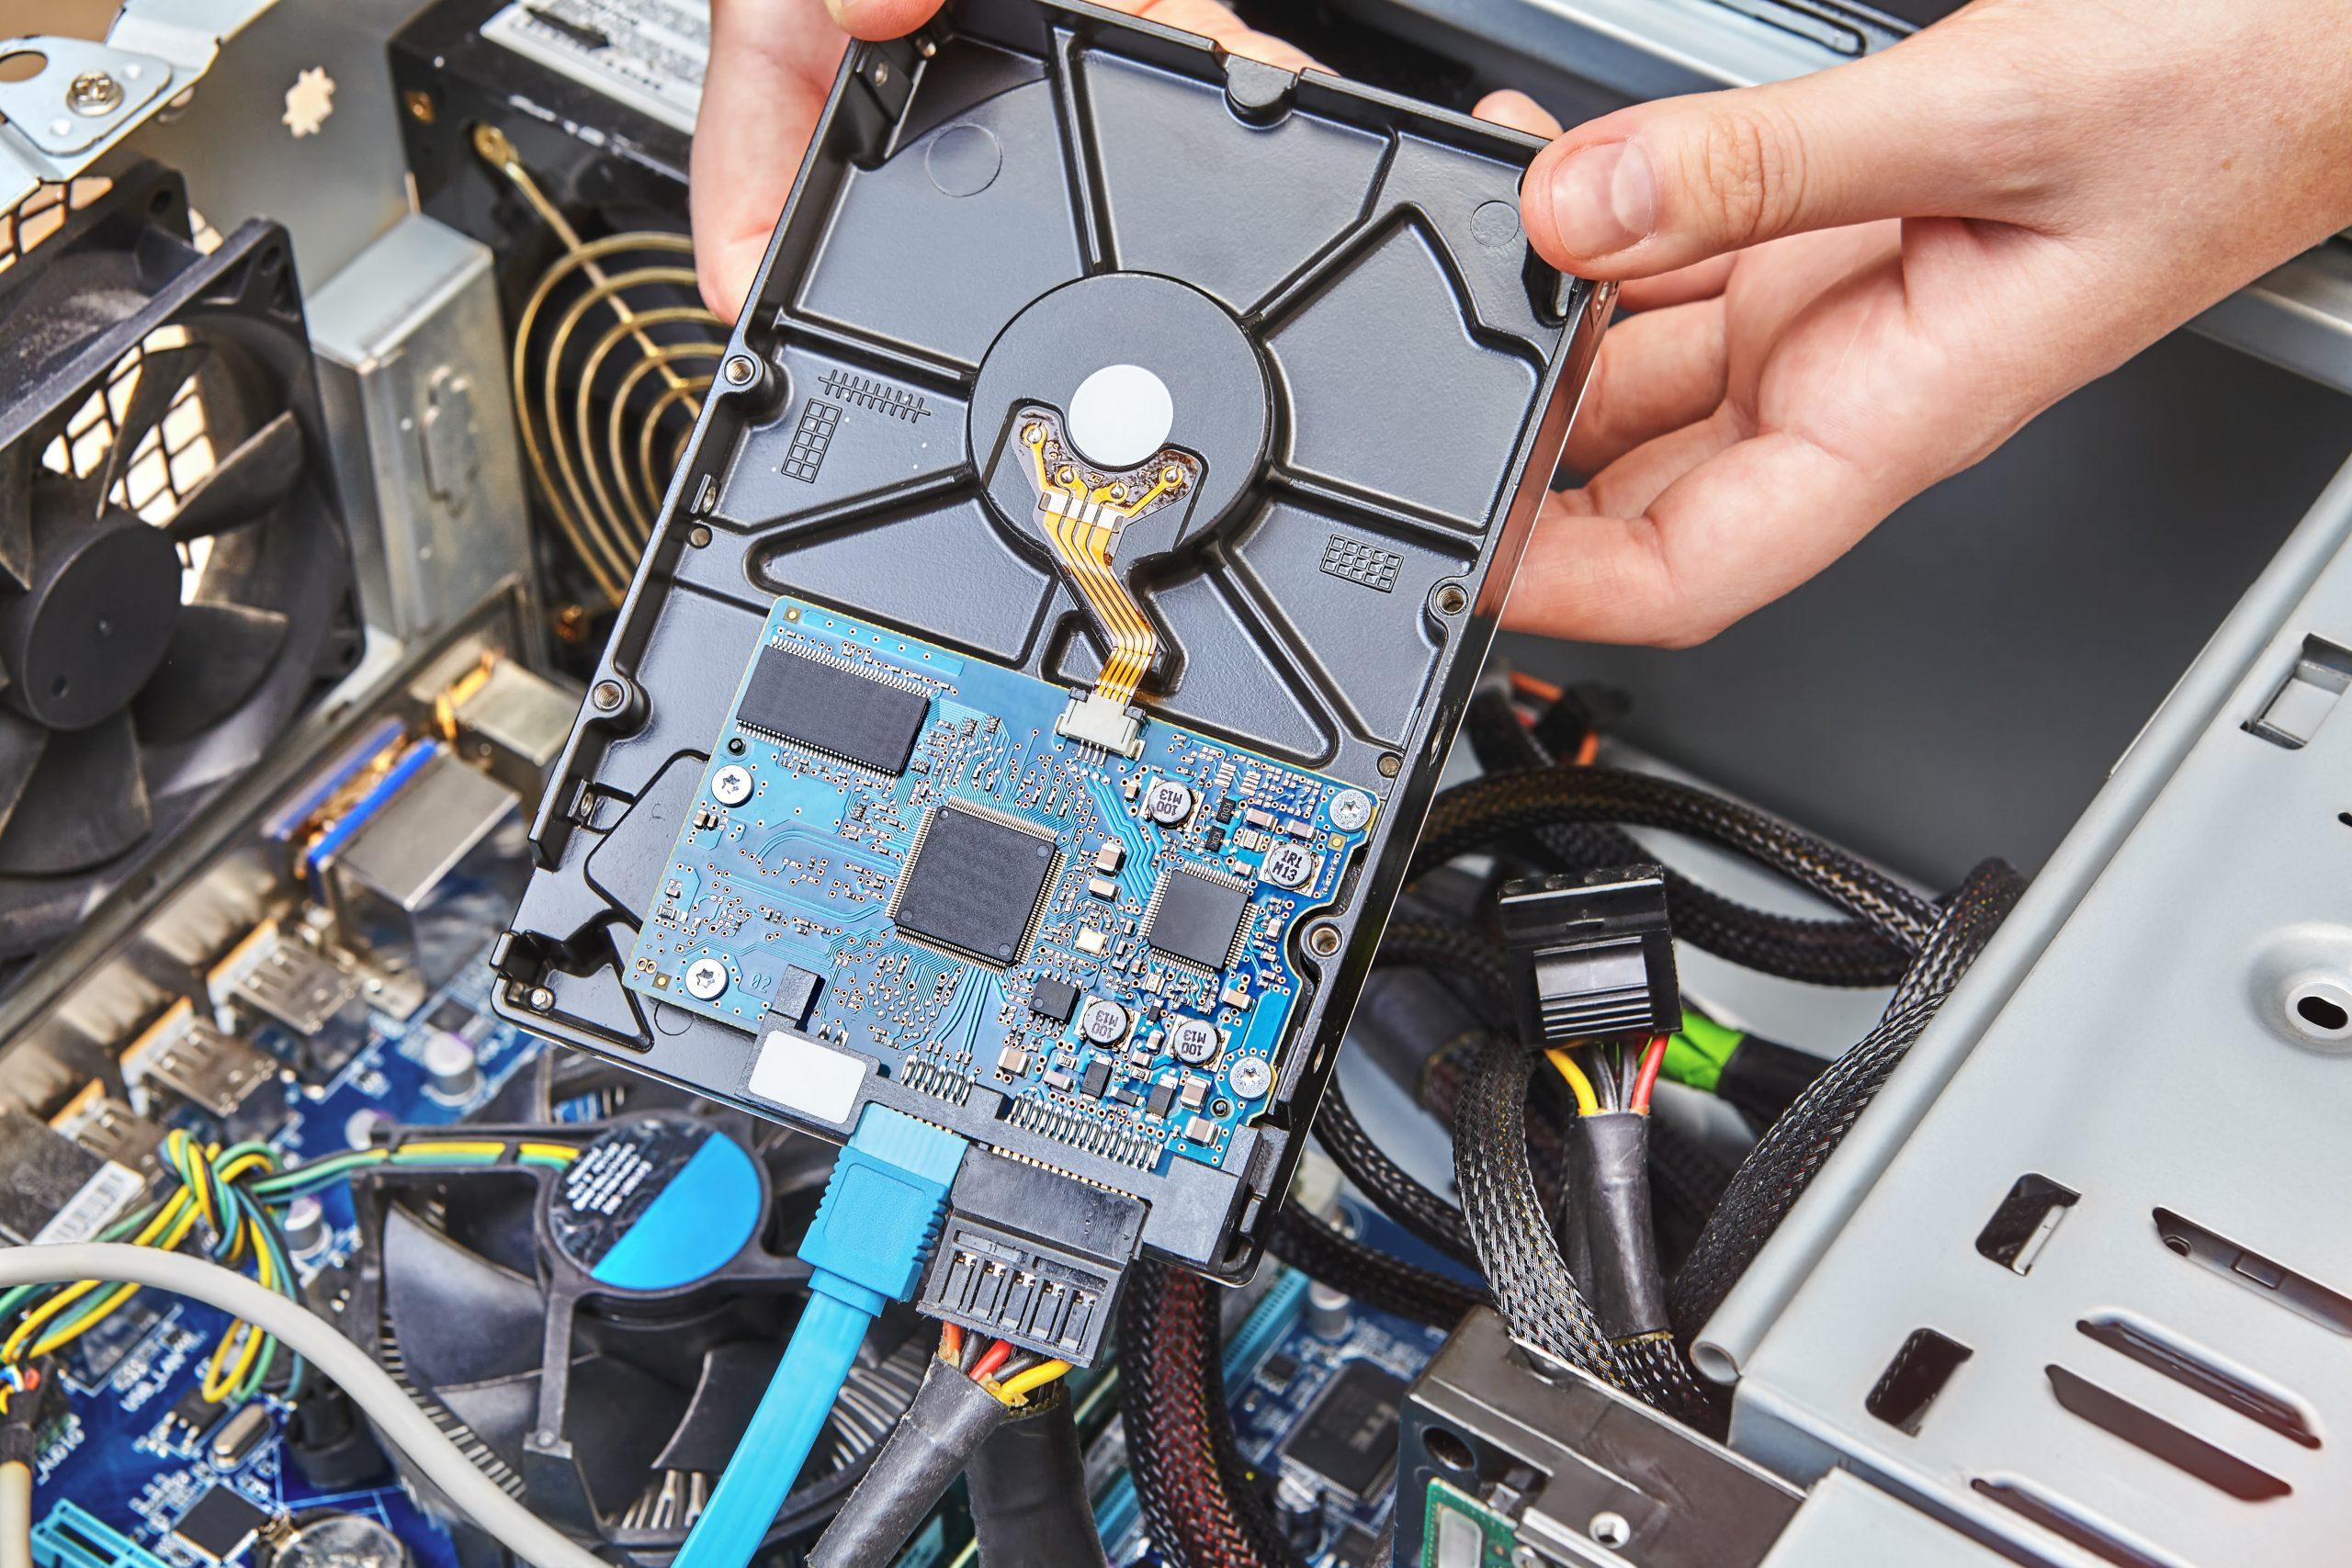 Repairman is installing an internal hard drive of the desktop PC, close up.